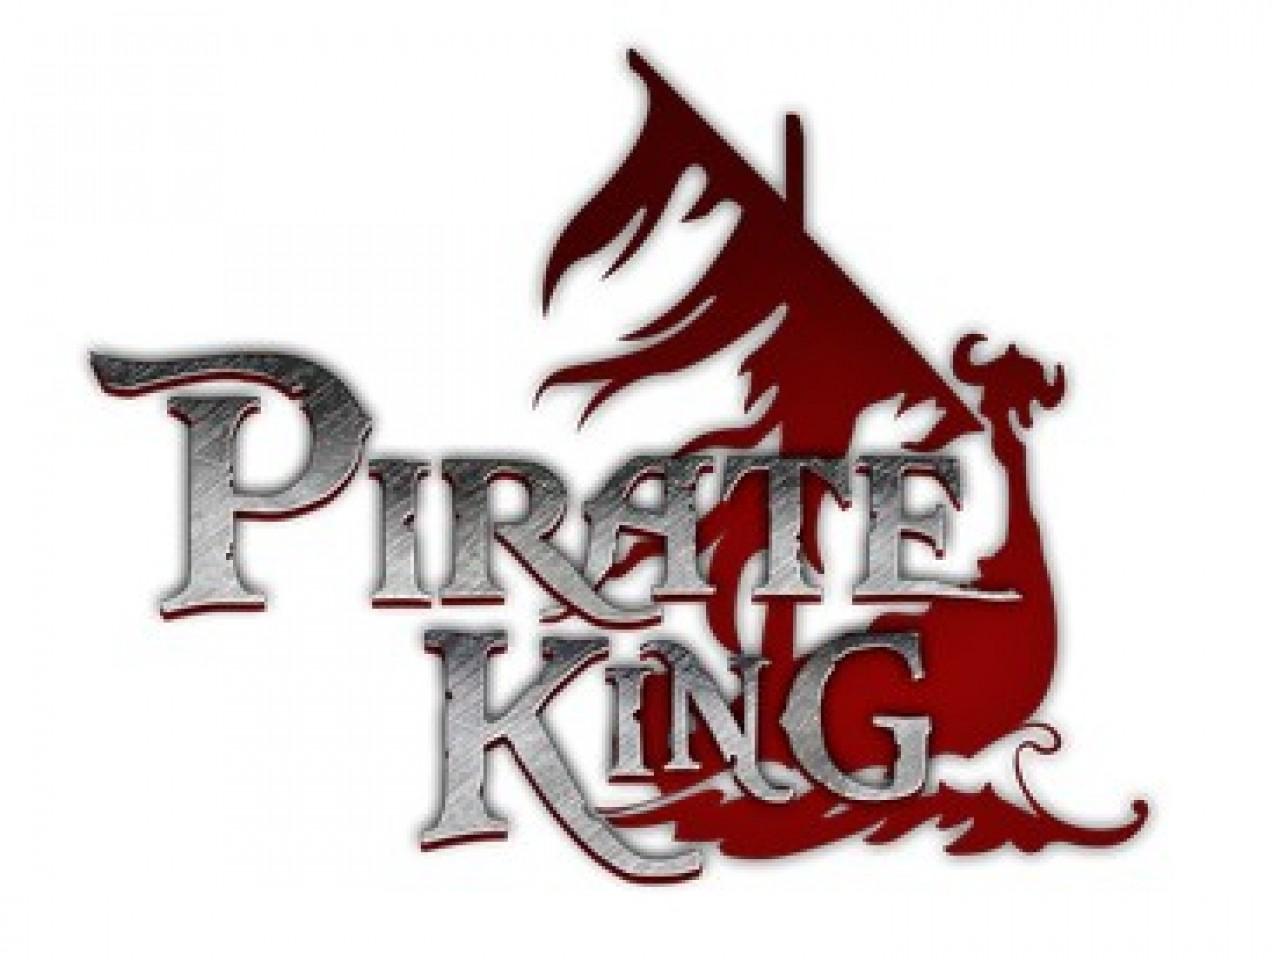 Pirate King Thailand ส่งตั๋วลงเรือเที่ยวแรก สู่มือทุกคน